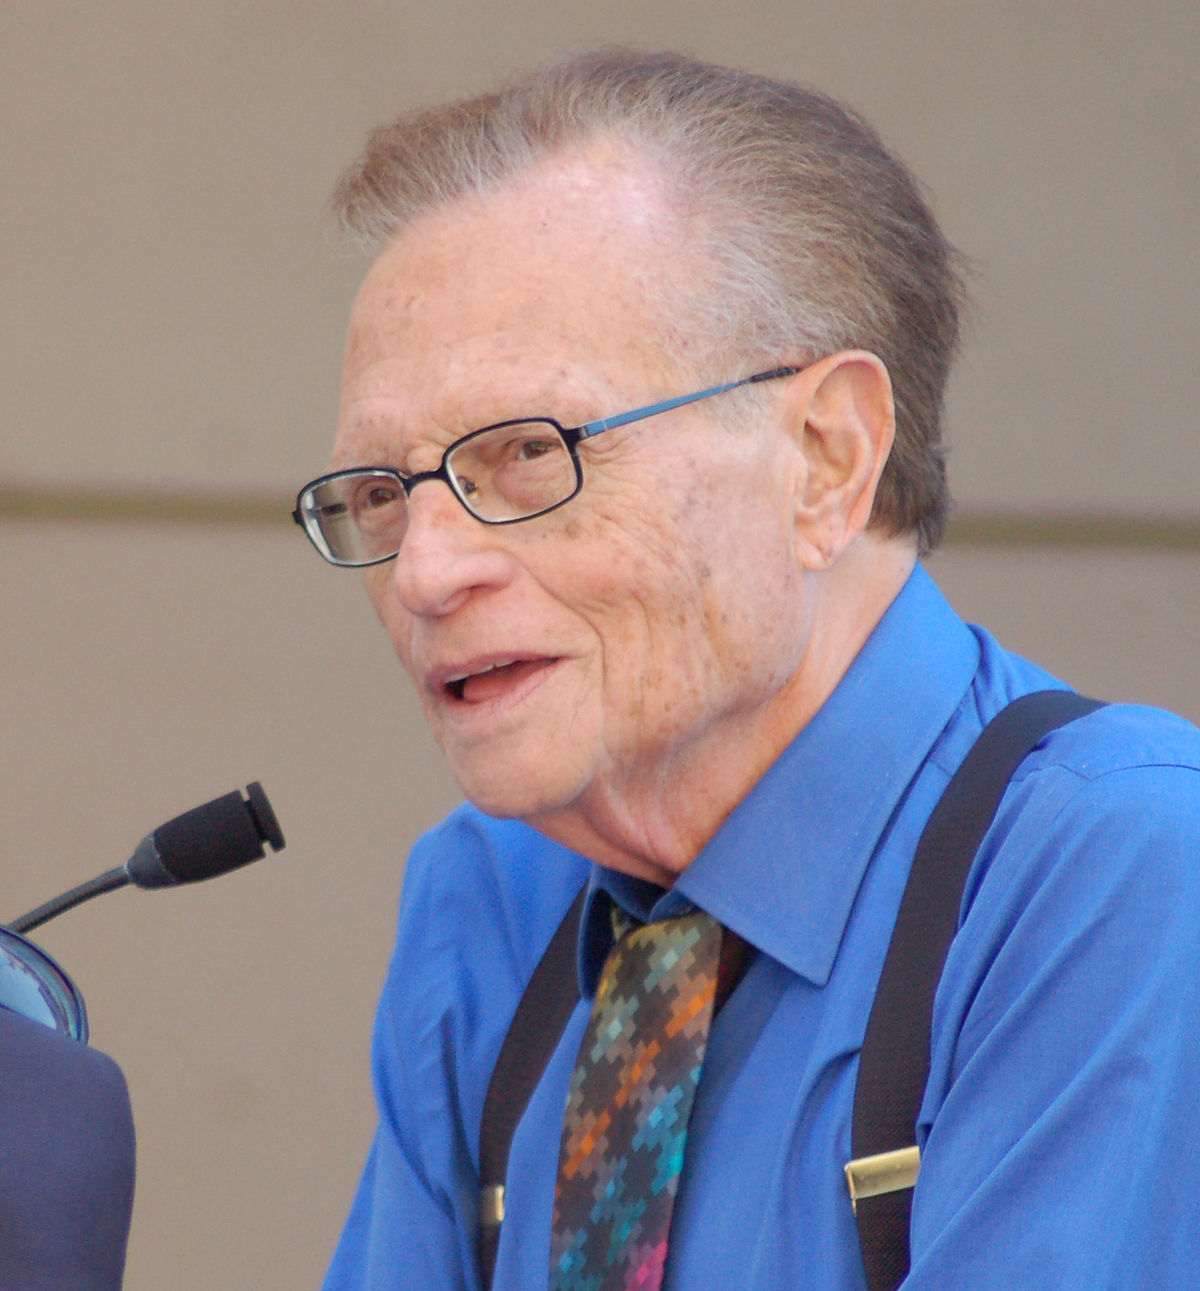 Larry King - Wikipedia